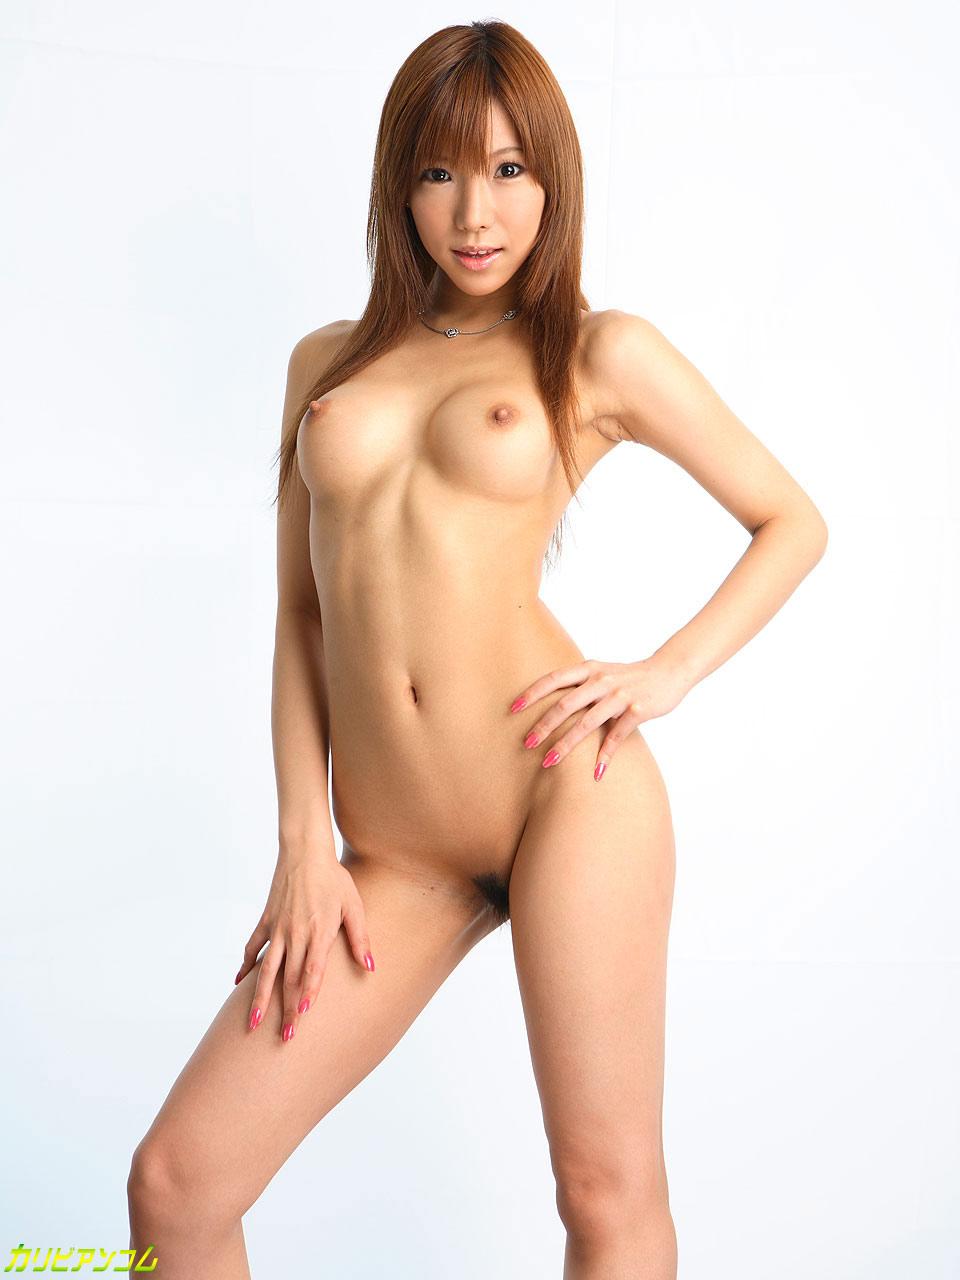 最高の美乳娘 Part.2 早川瀬里奈